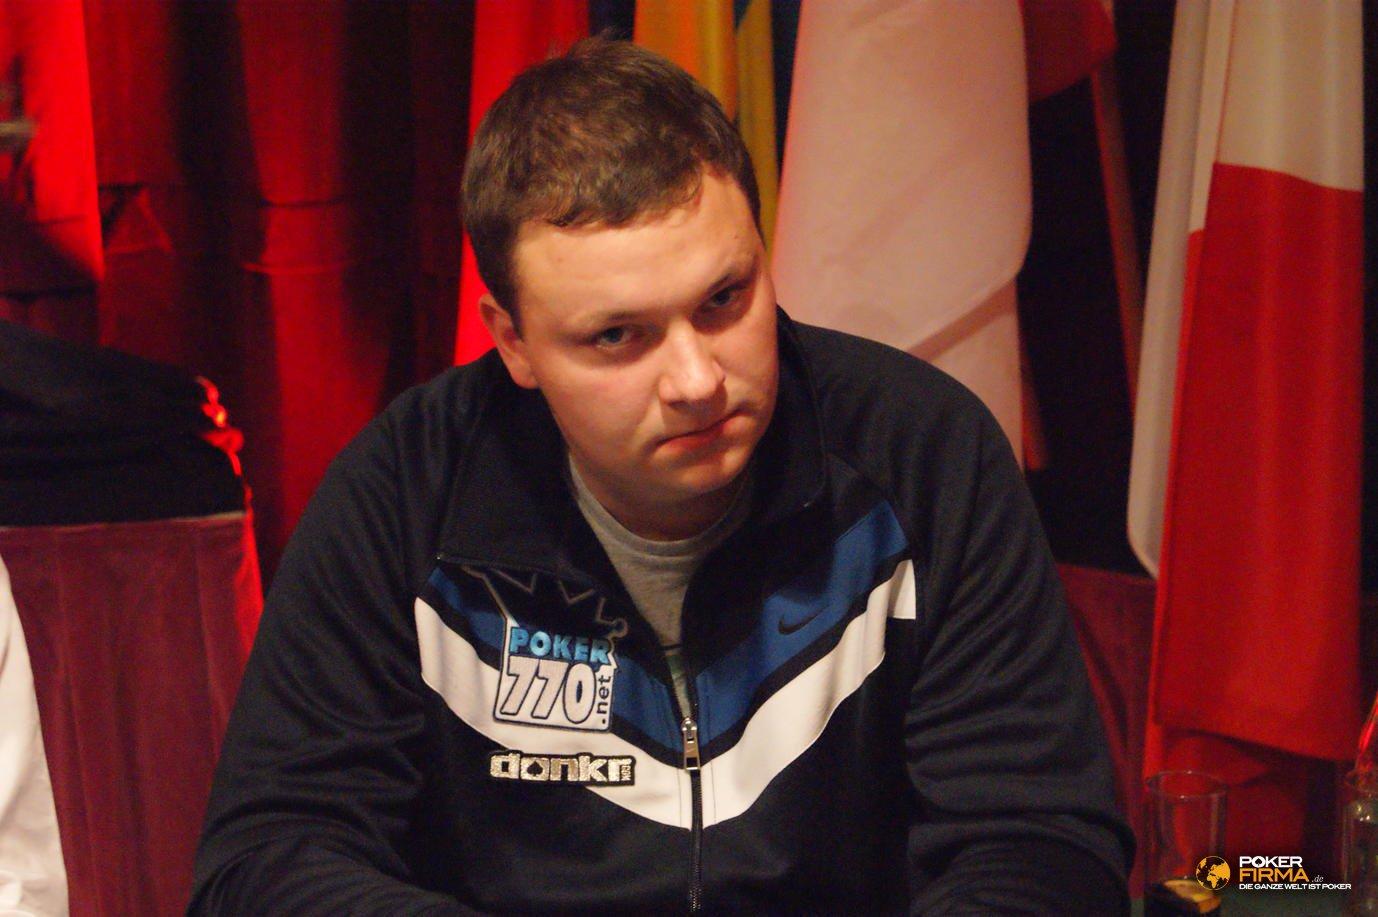 Poker_EM_2000_NLH_251011_Julian_Herold